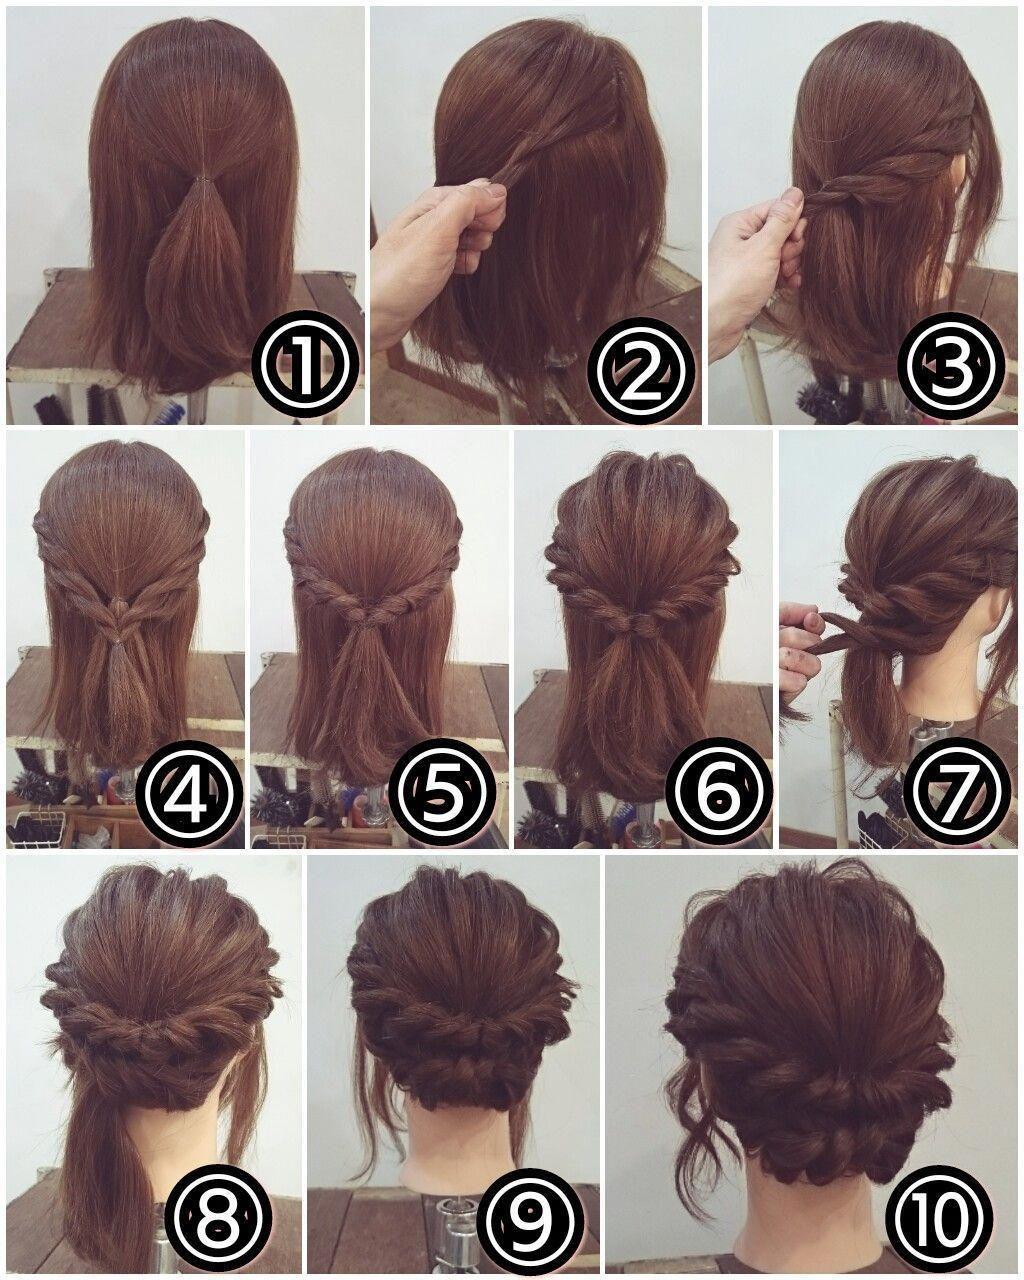 beautiful braided hairstyles #shortbraidedhairstyles